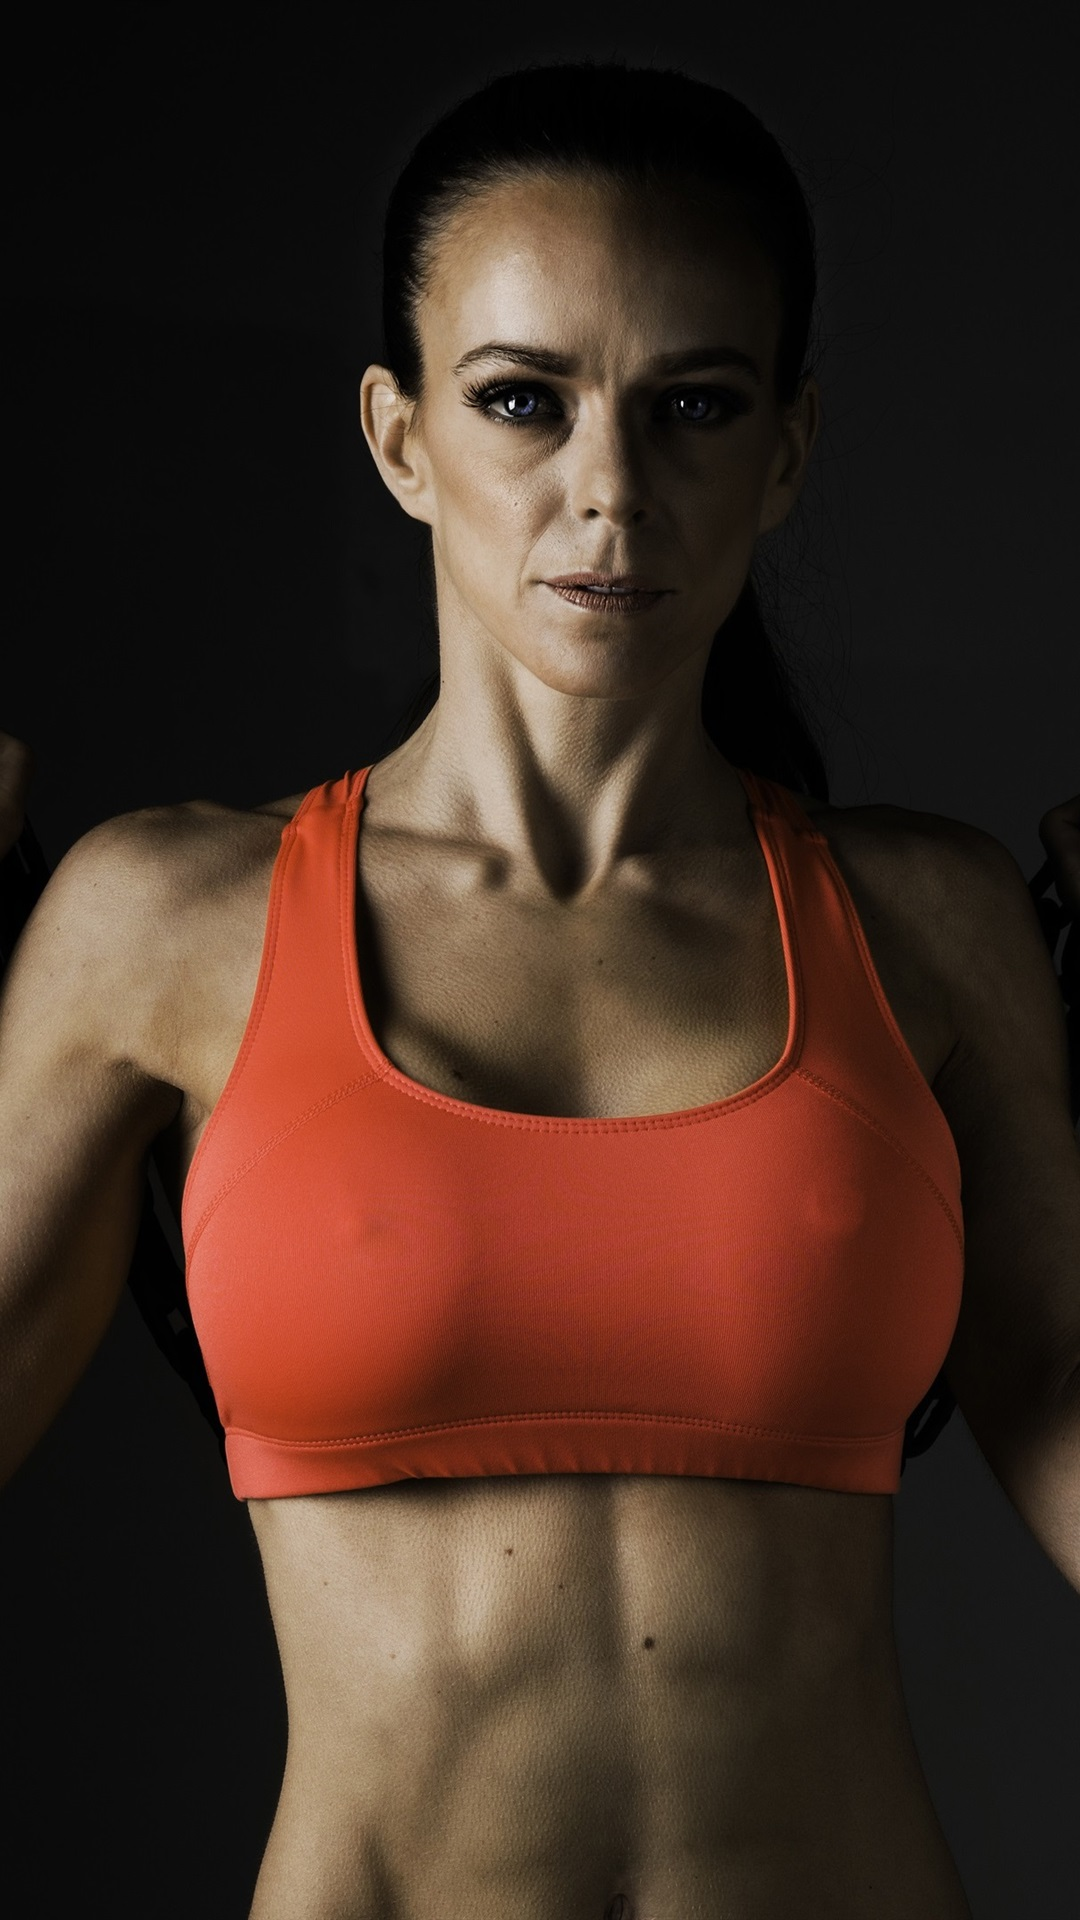 Wallpaper Fitness Women Workout Metal Chain 3840x2160 Uhd